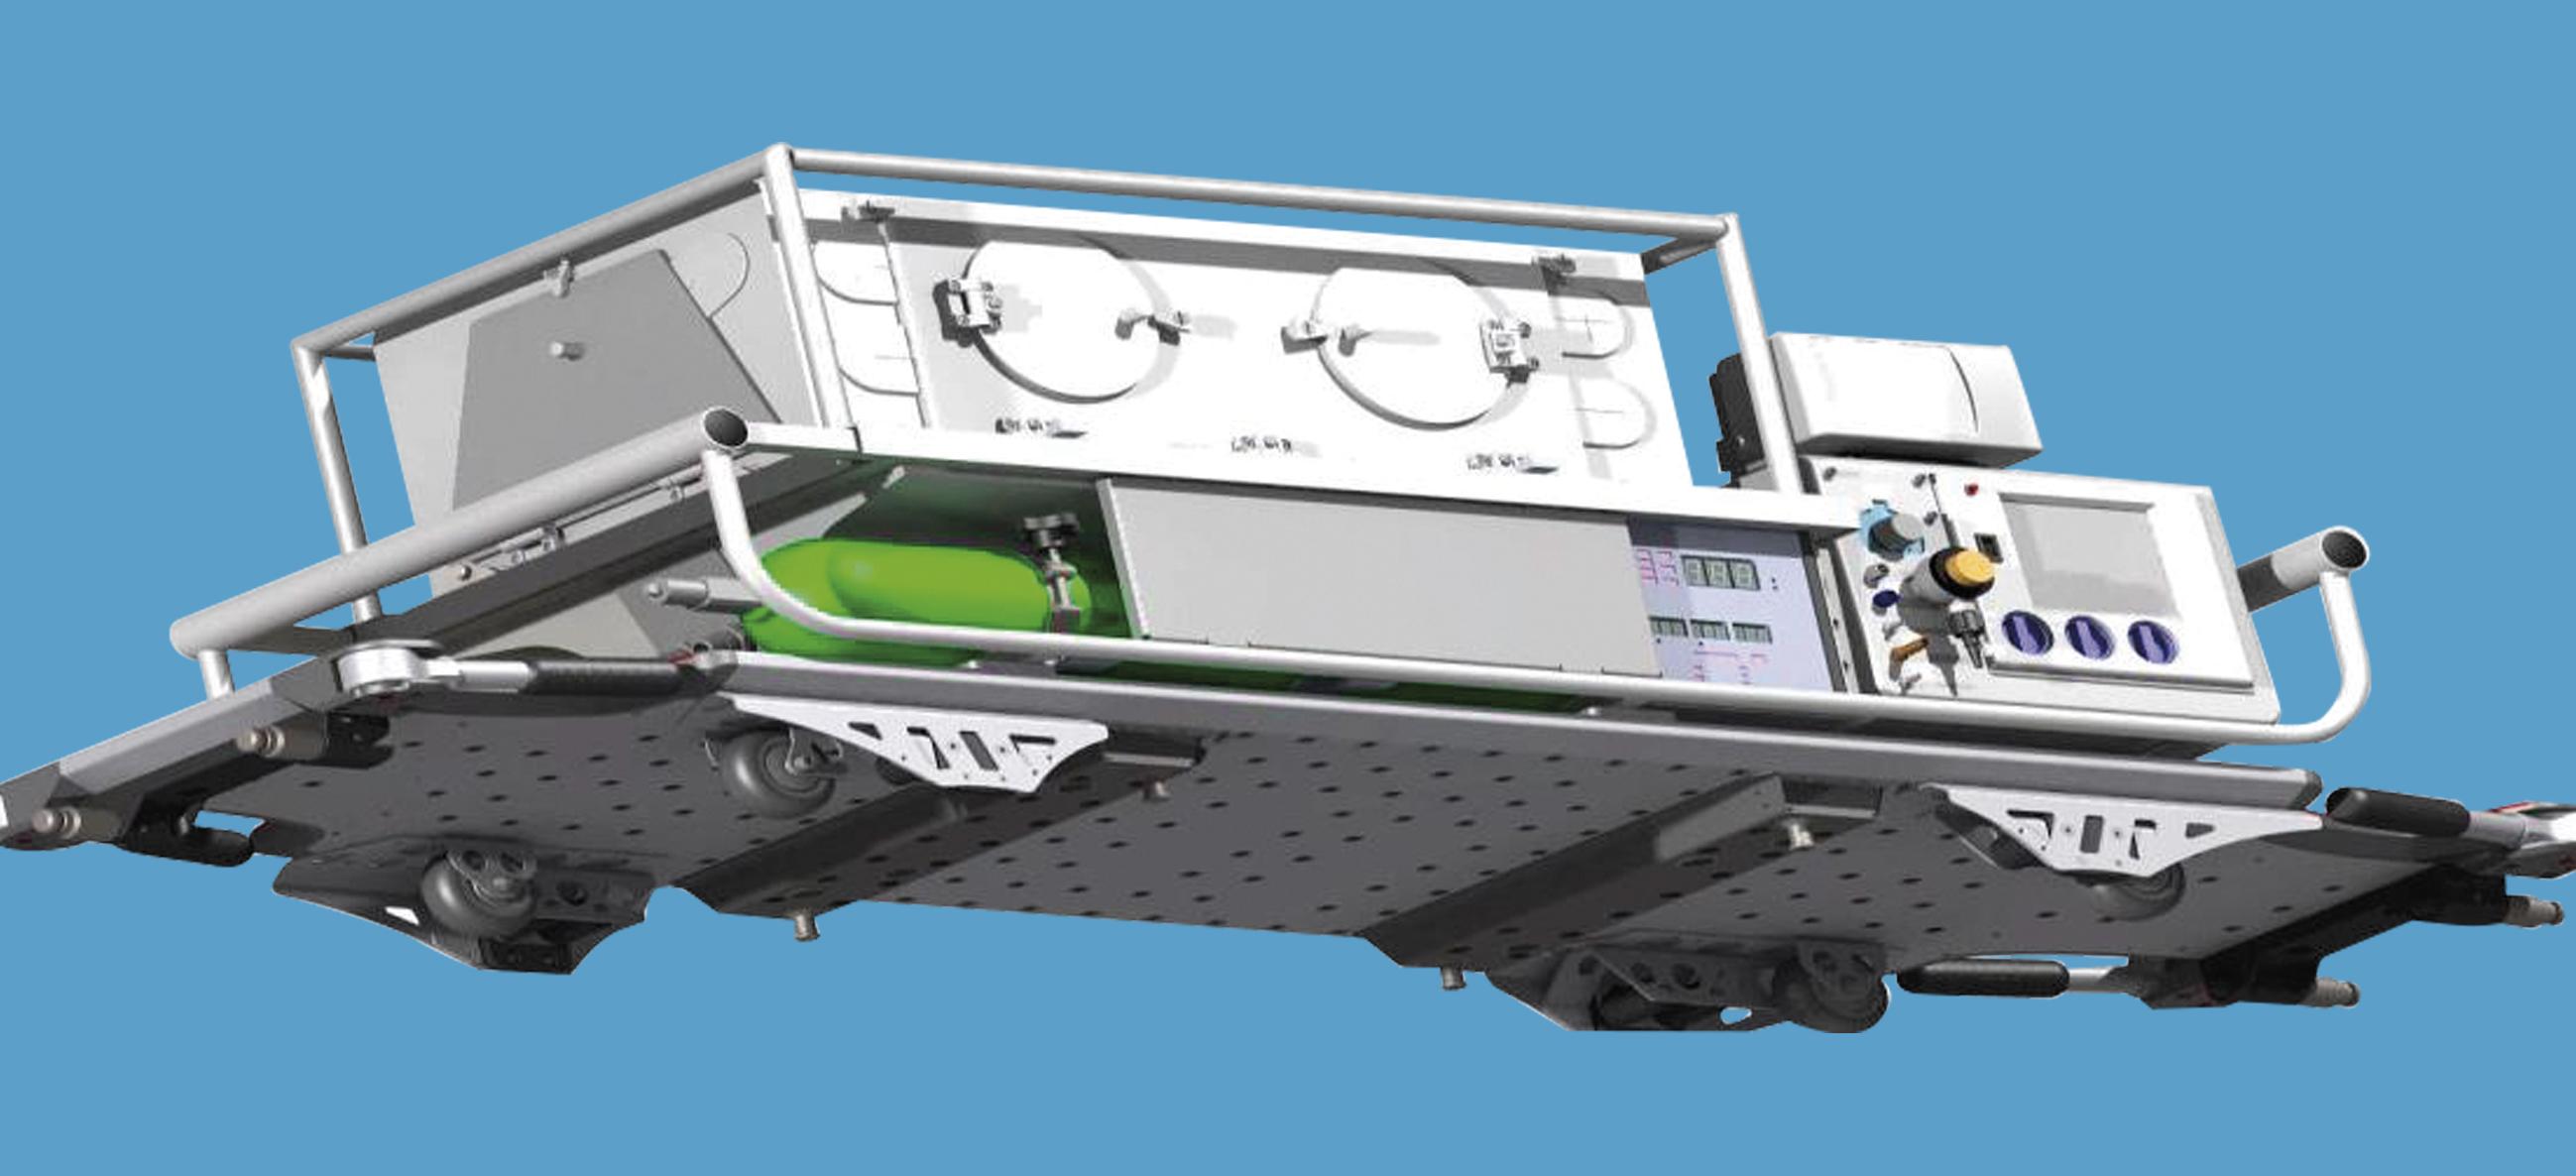 Incubator Installation Kit